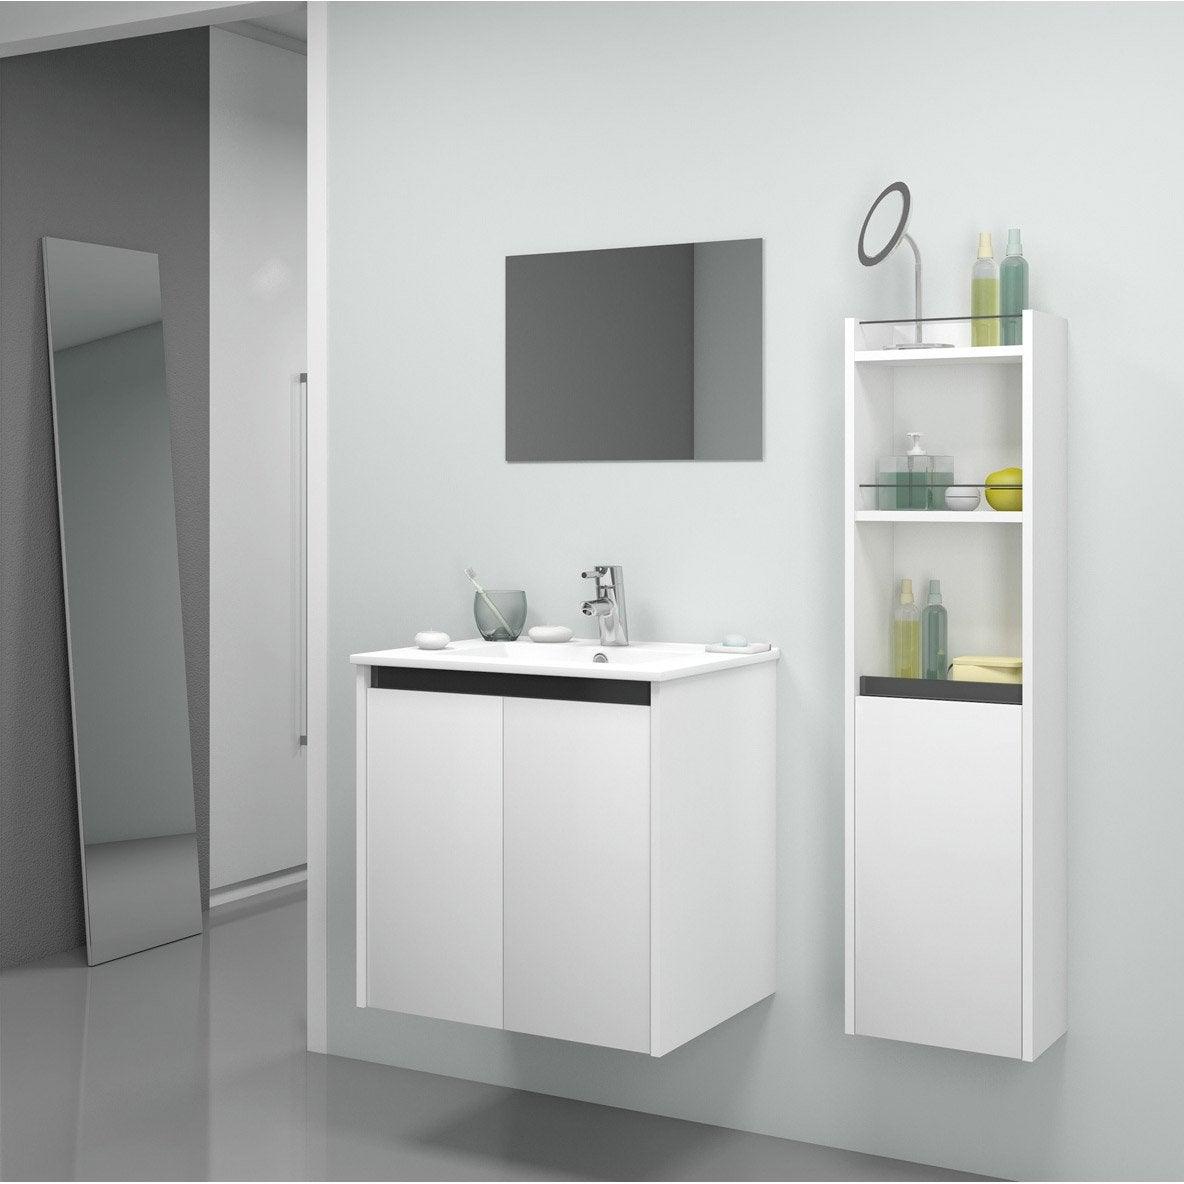 Mobilier salle de bain leroy merlin - Salle de bain leroy merlin neo ...